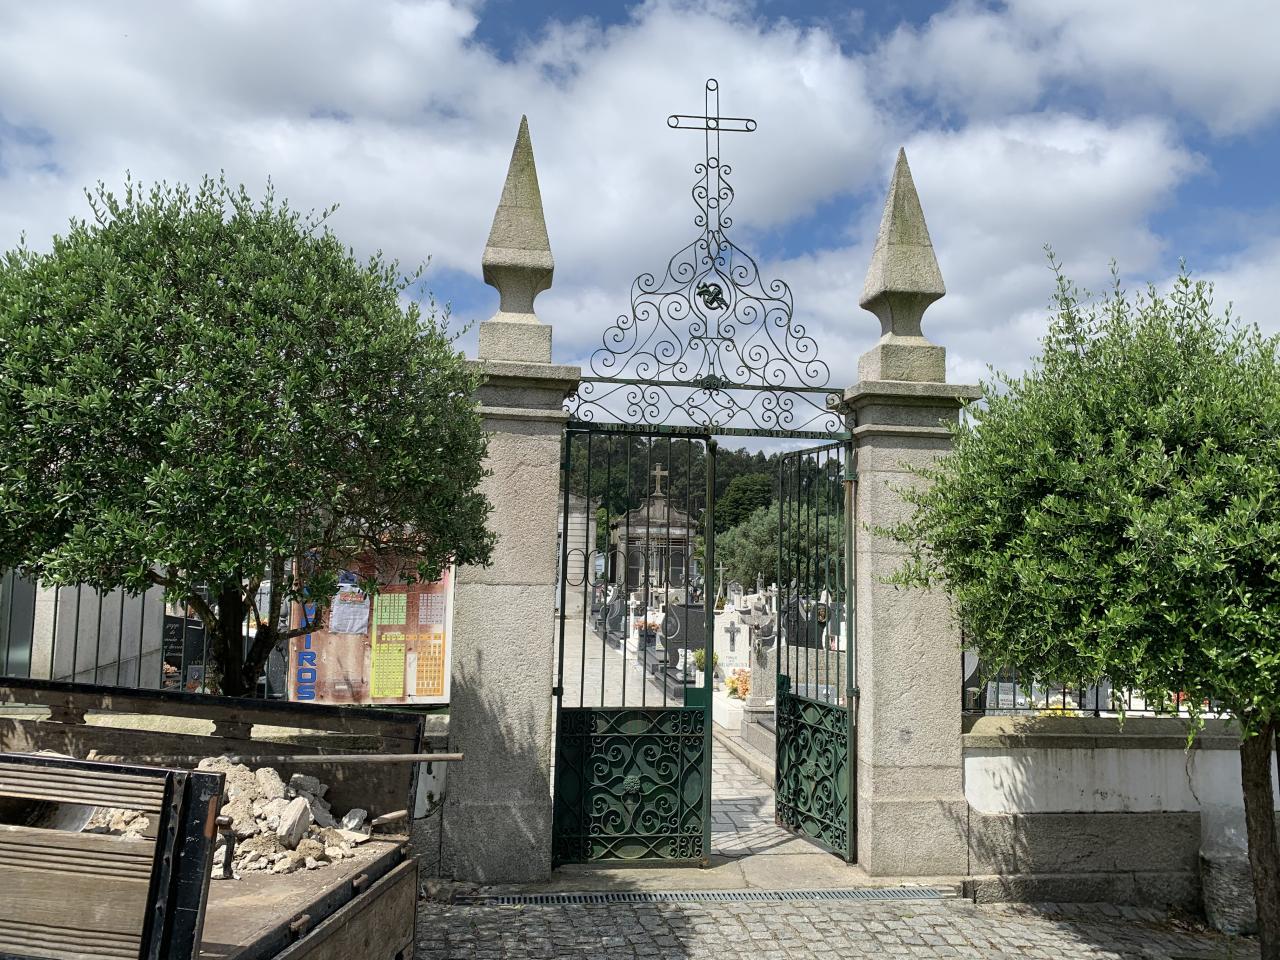 Água pública - cemitério Silveiros